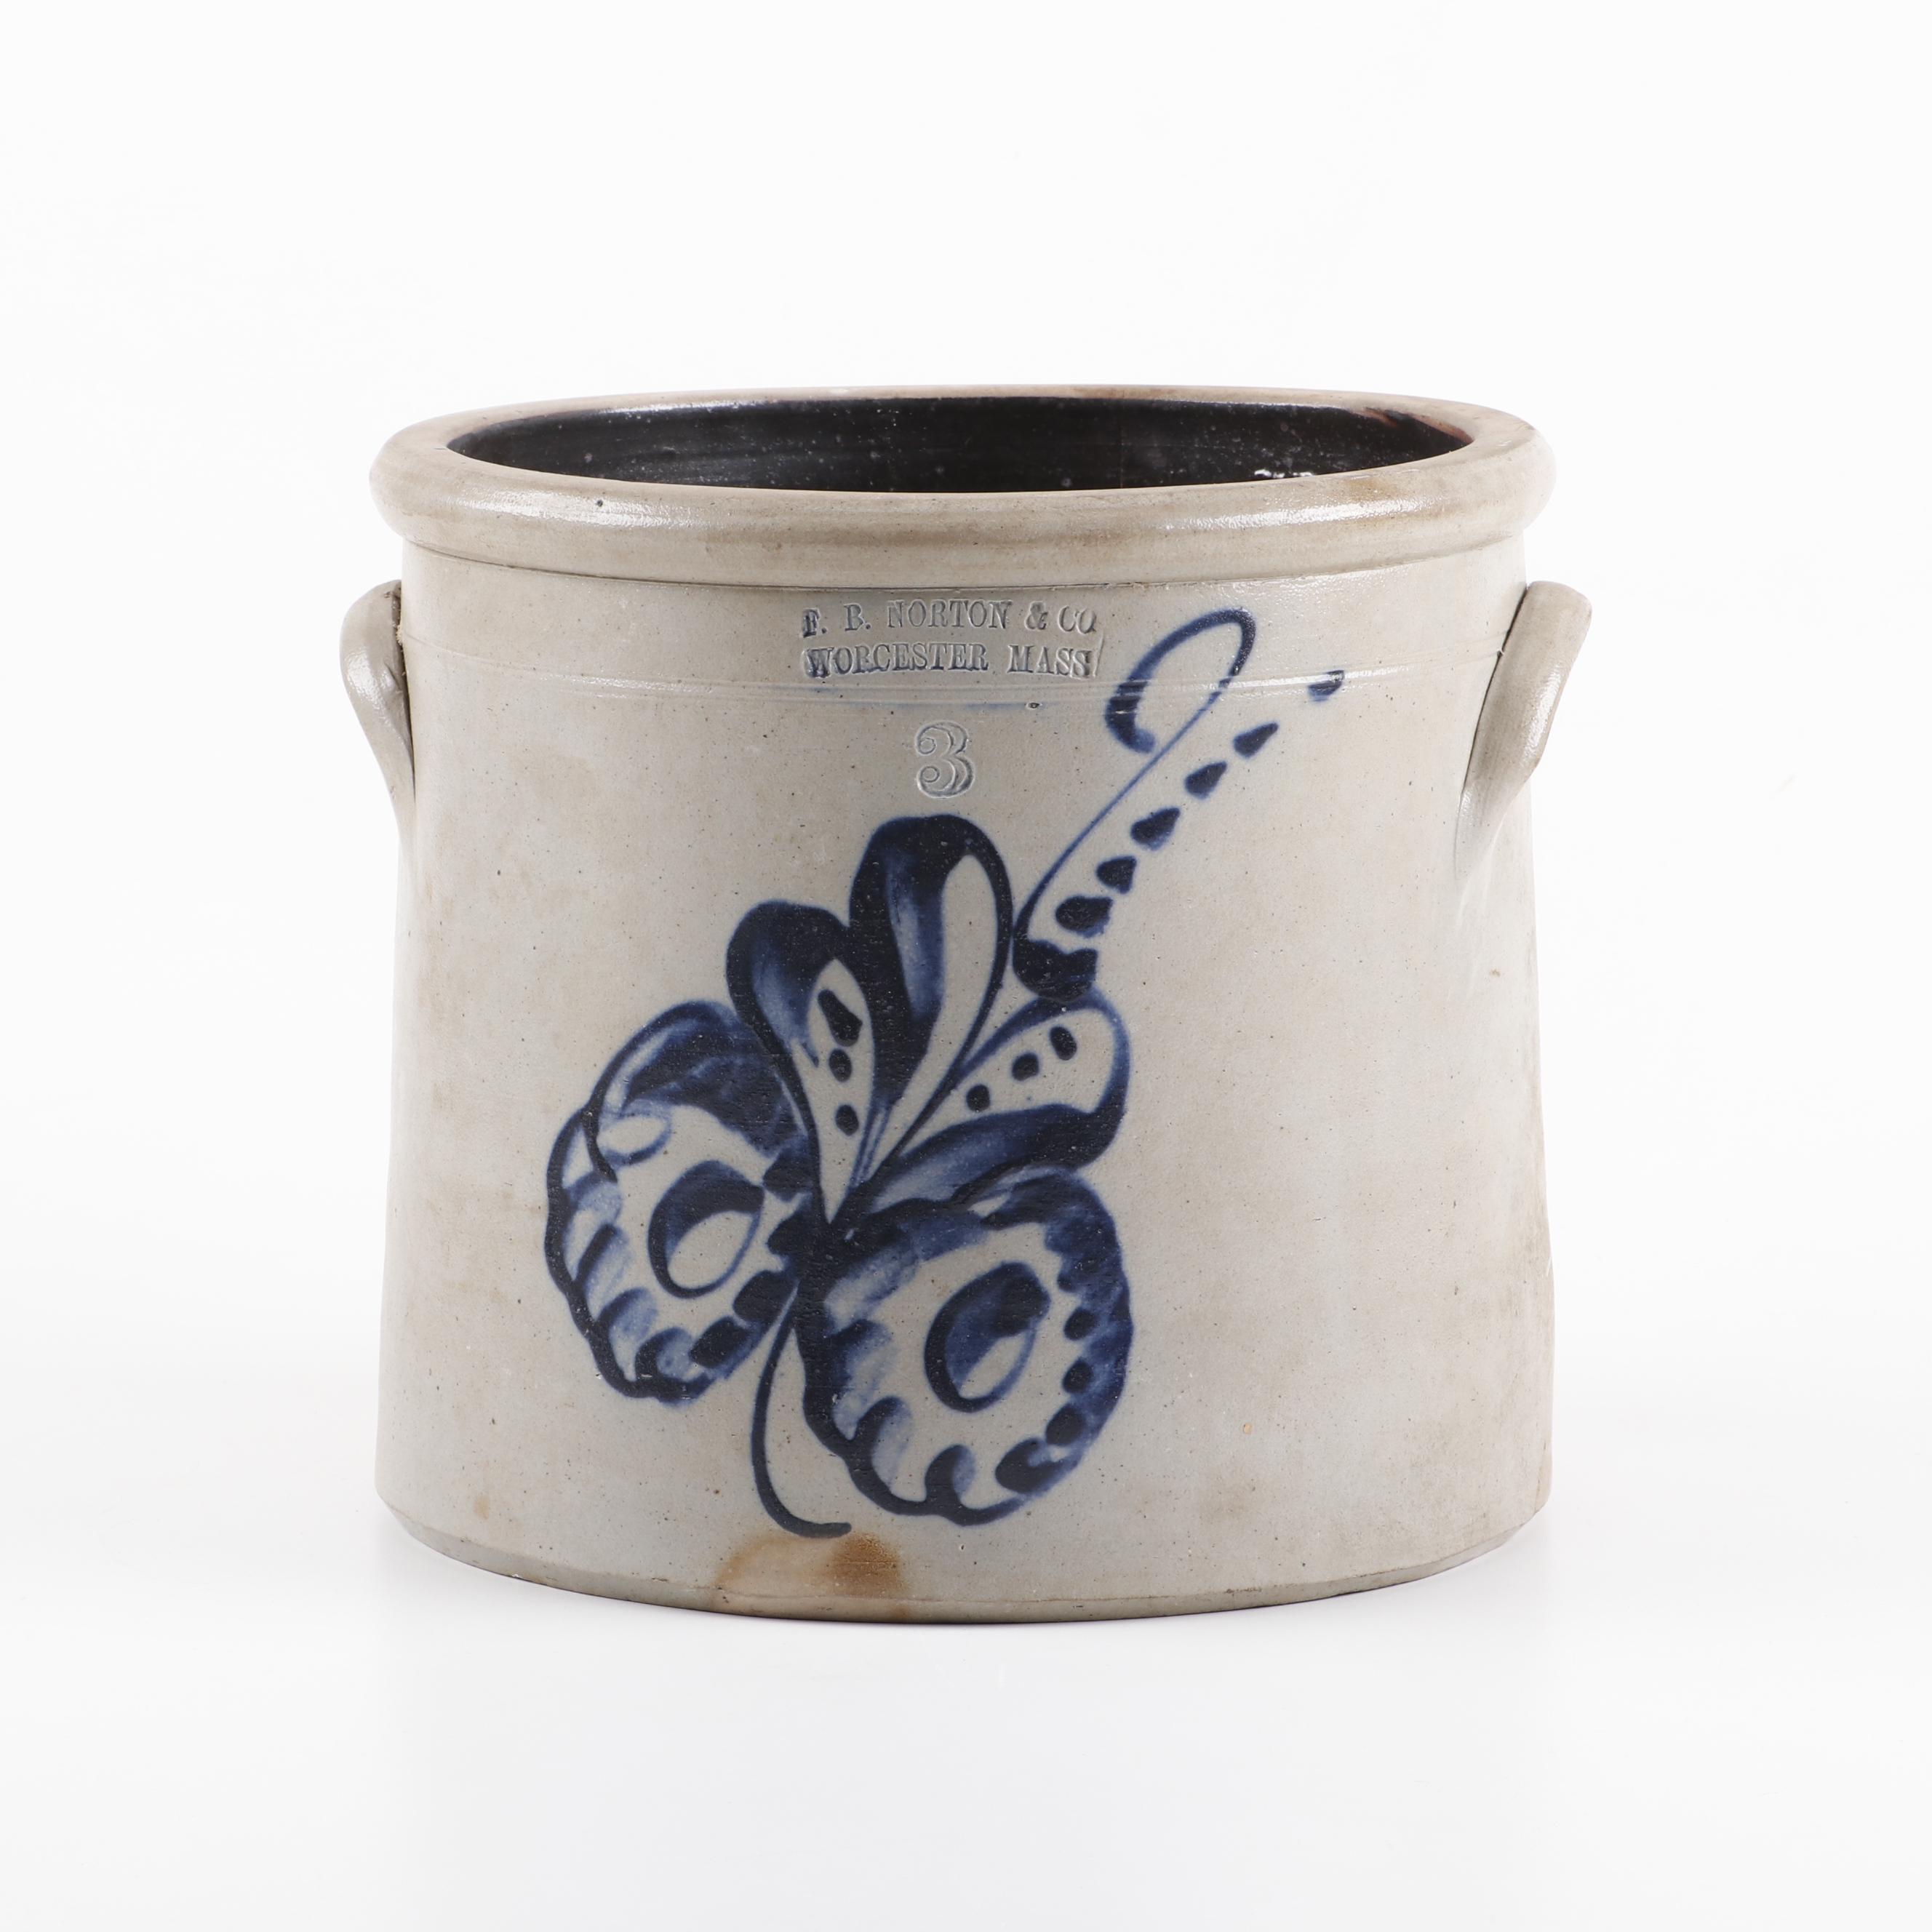 F.B. Norton and Co. Salt-Glazed Stoneware Crock, Late 19th/Early 20th Century